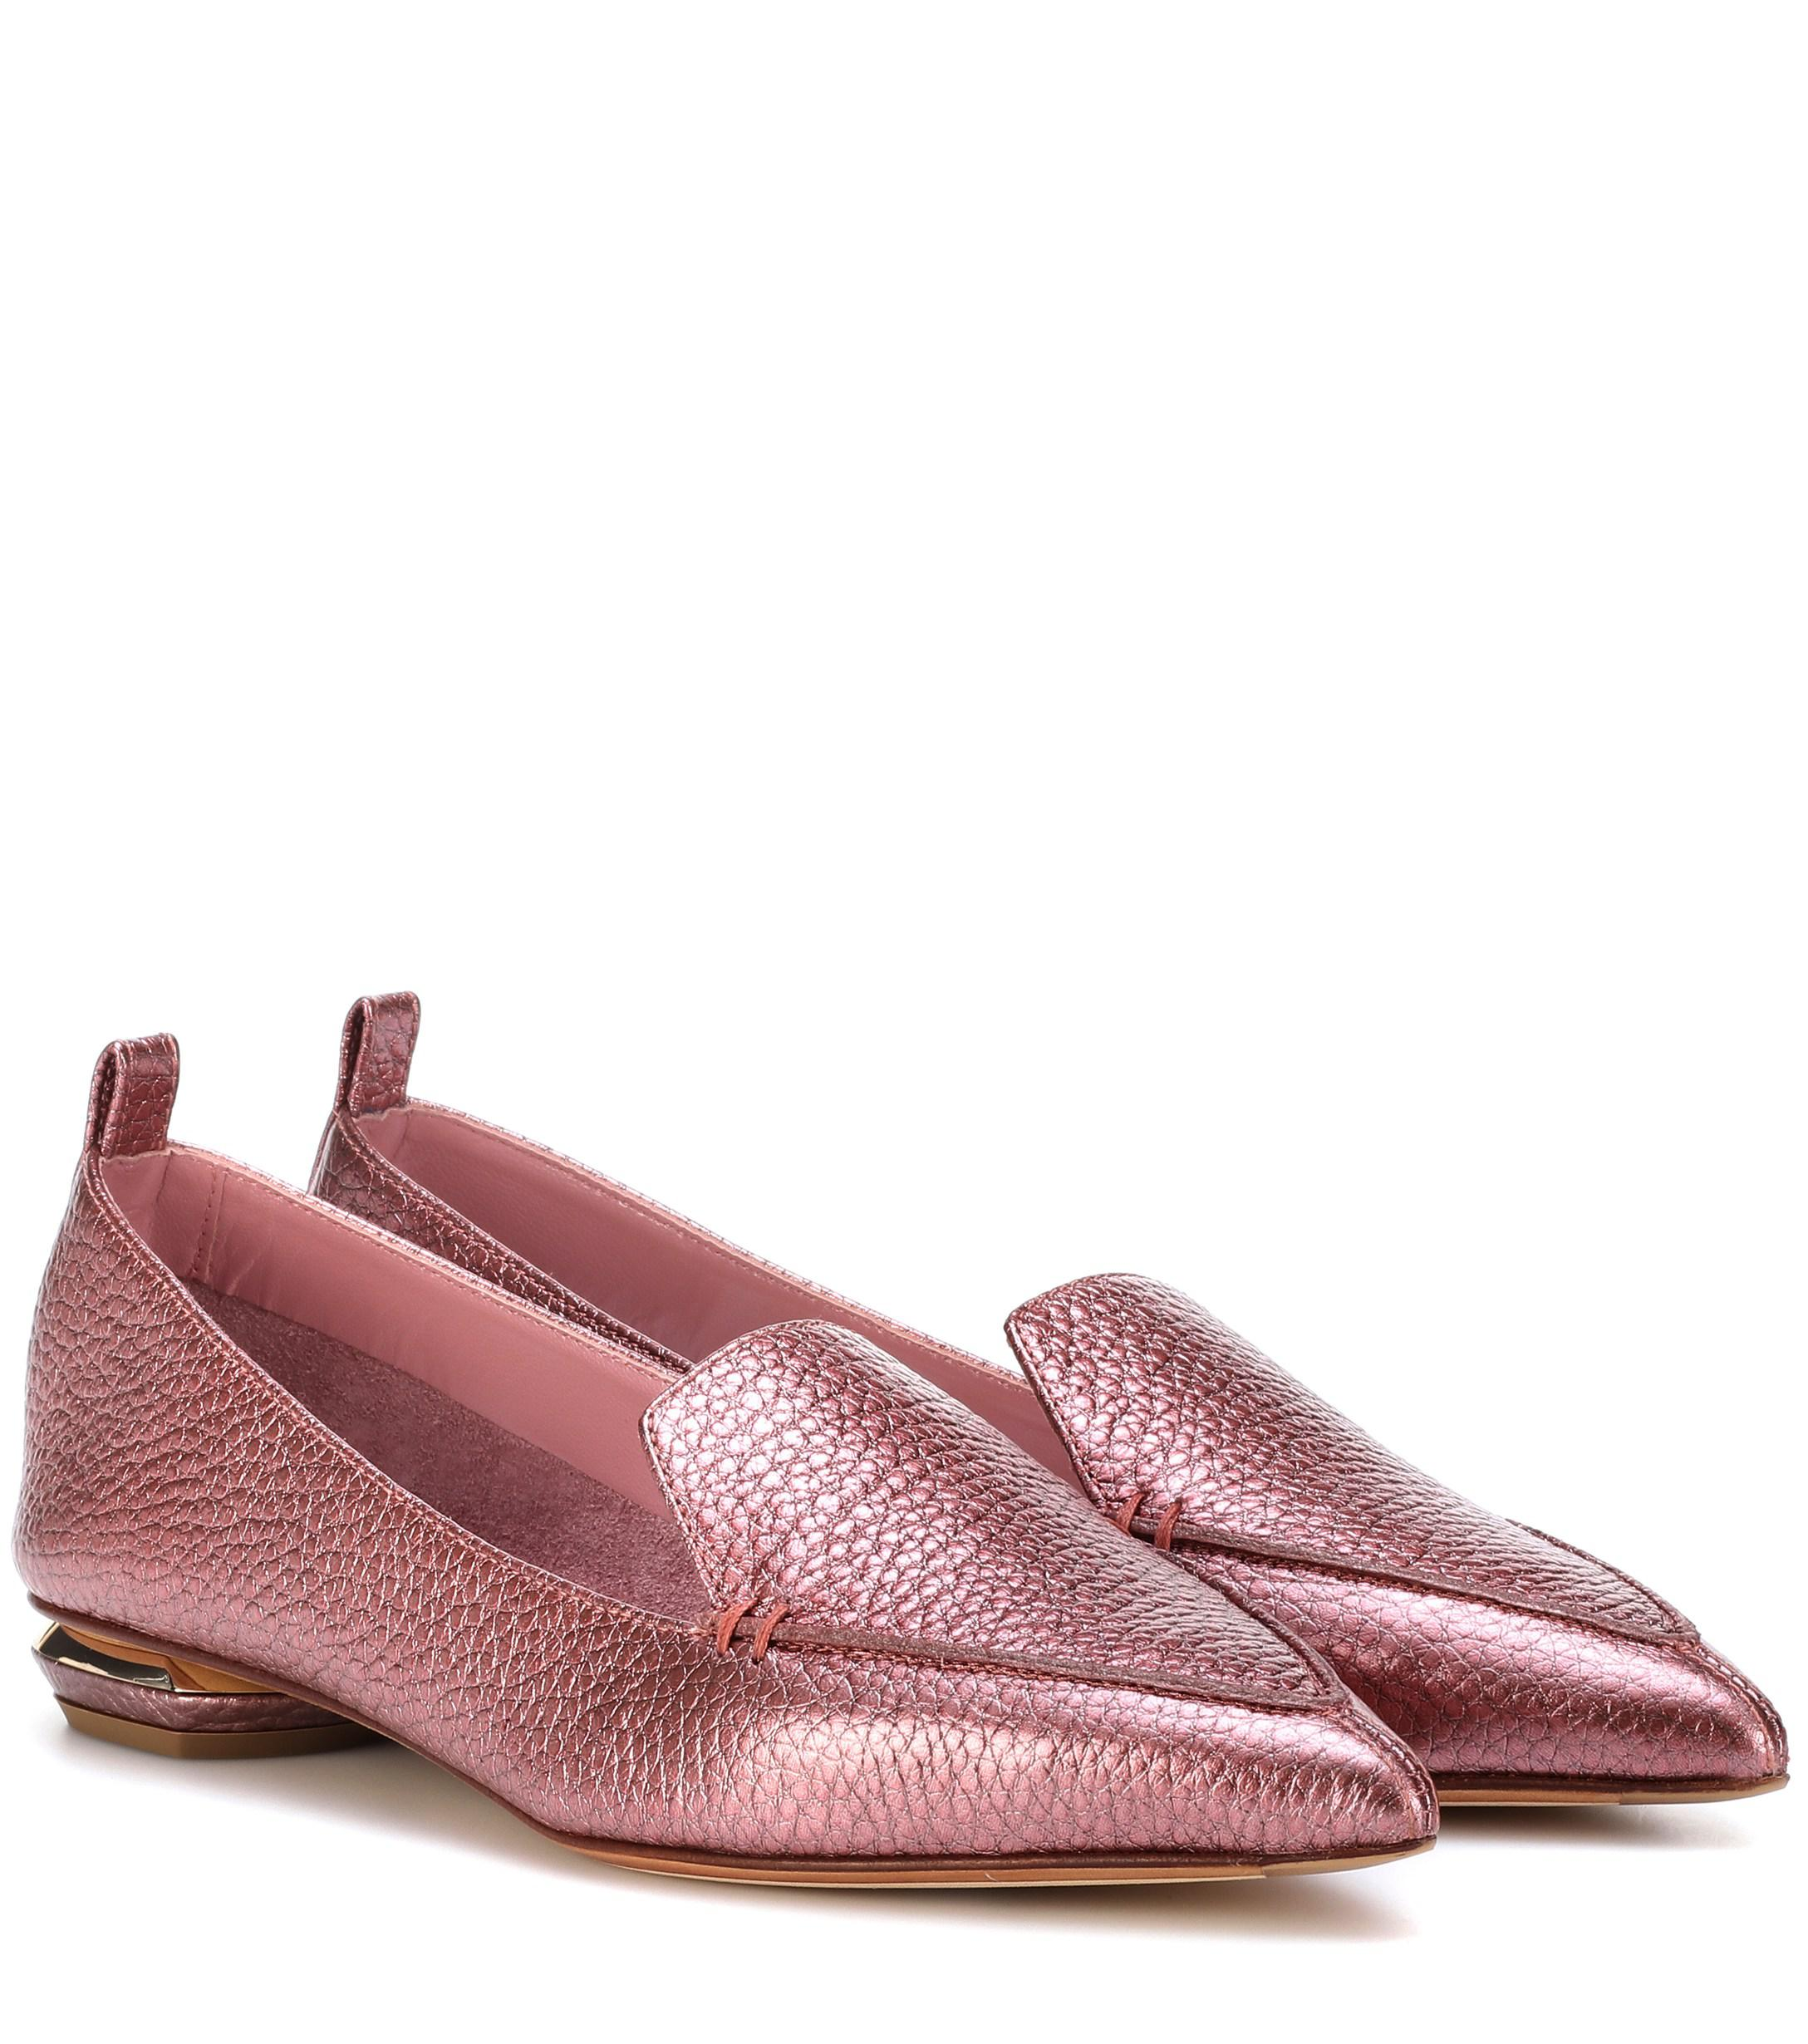 722199f3b71 Nicholas Kirkwood Beya Metallic Leather Loafers in Pink - Lyst